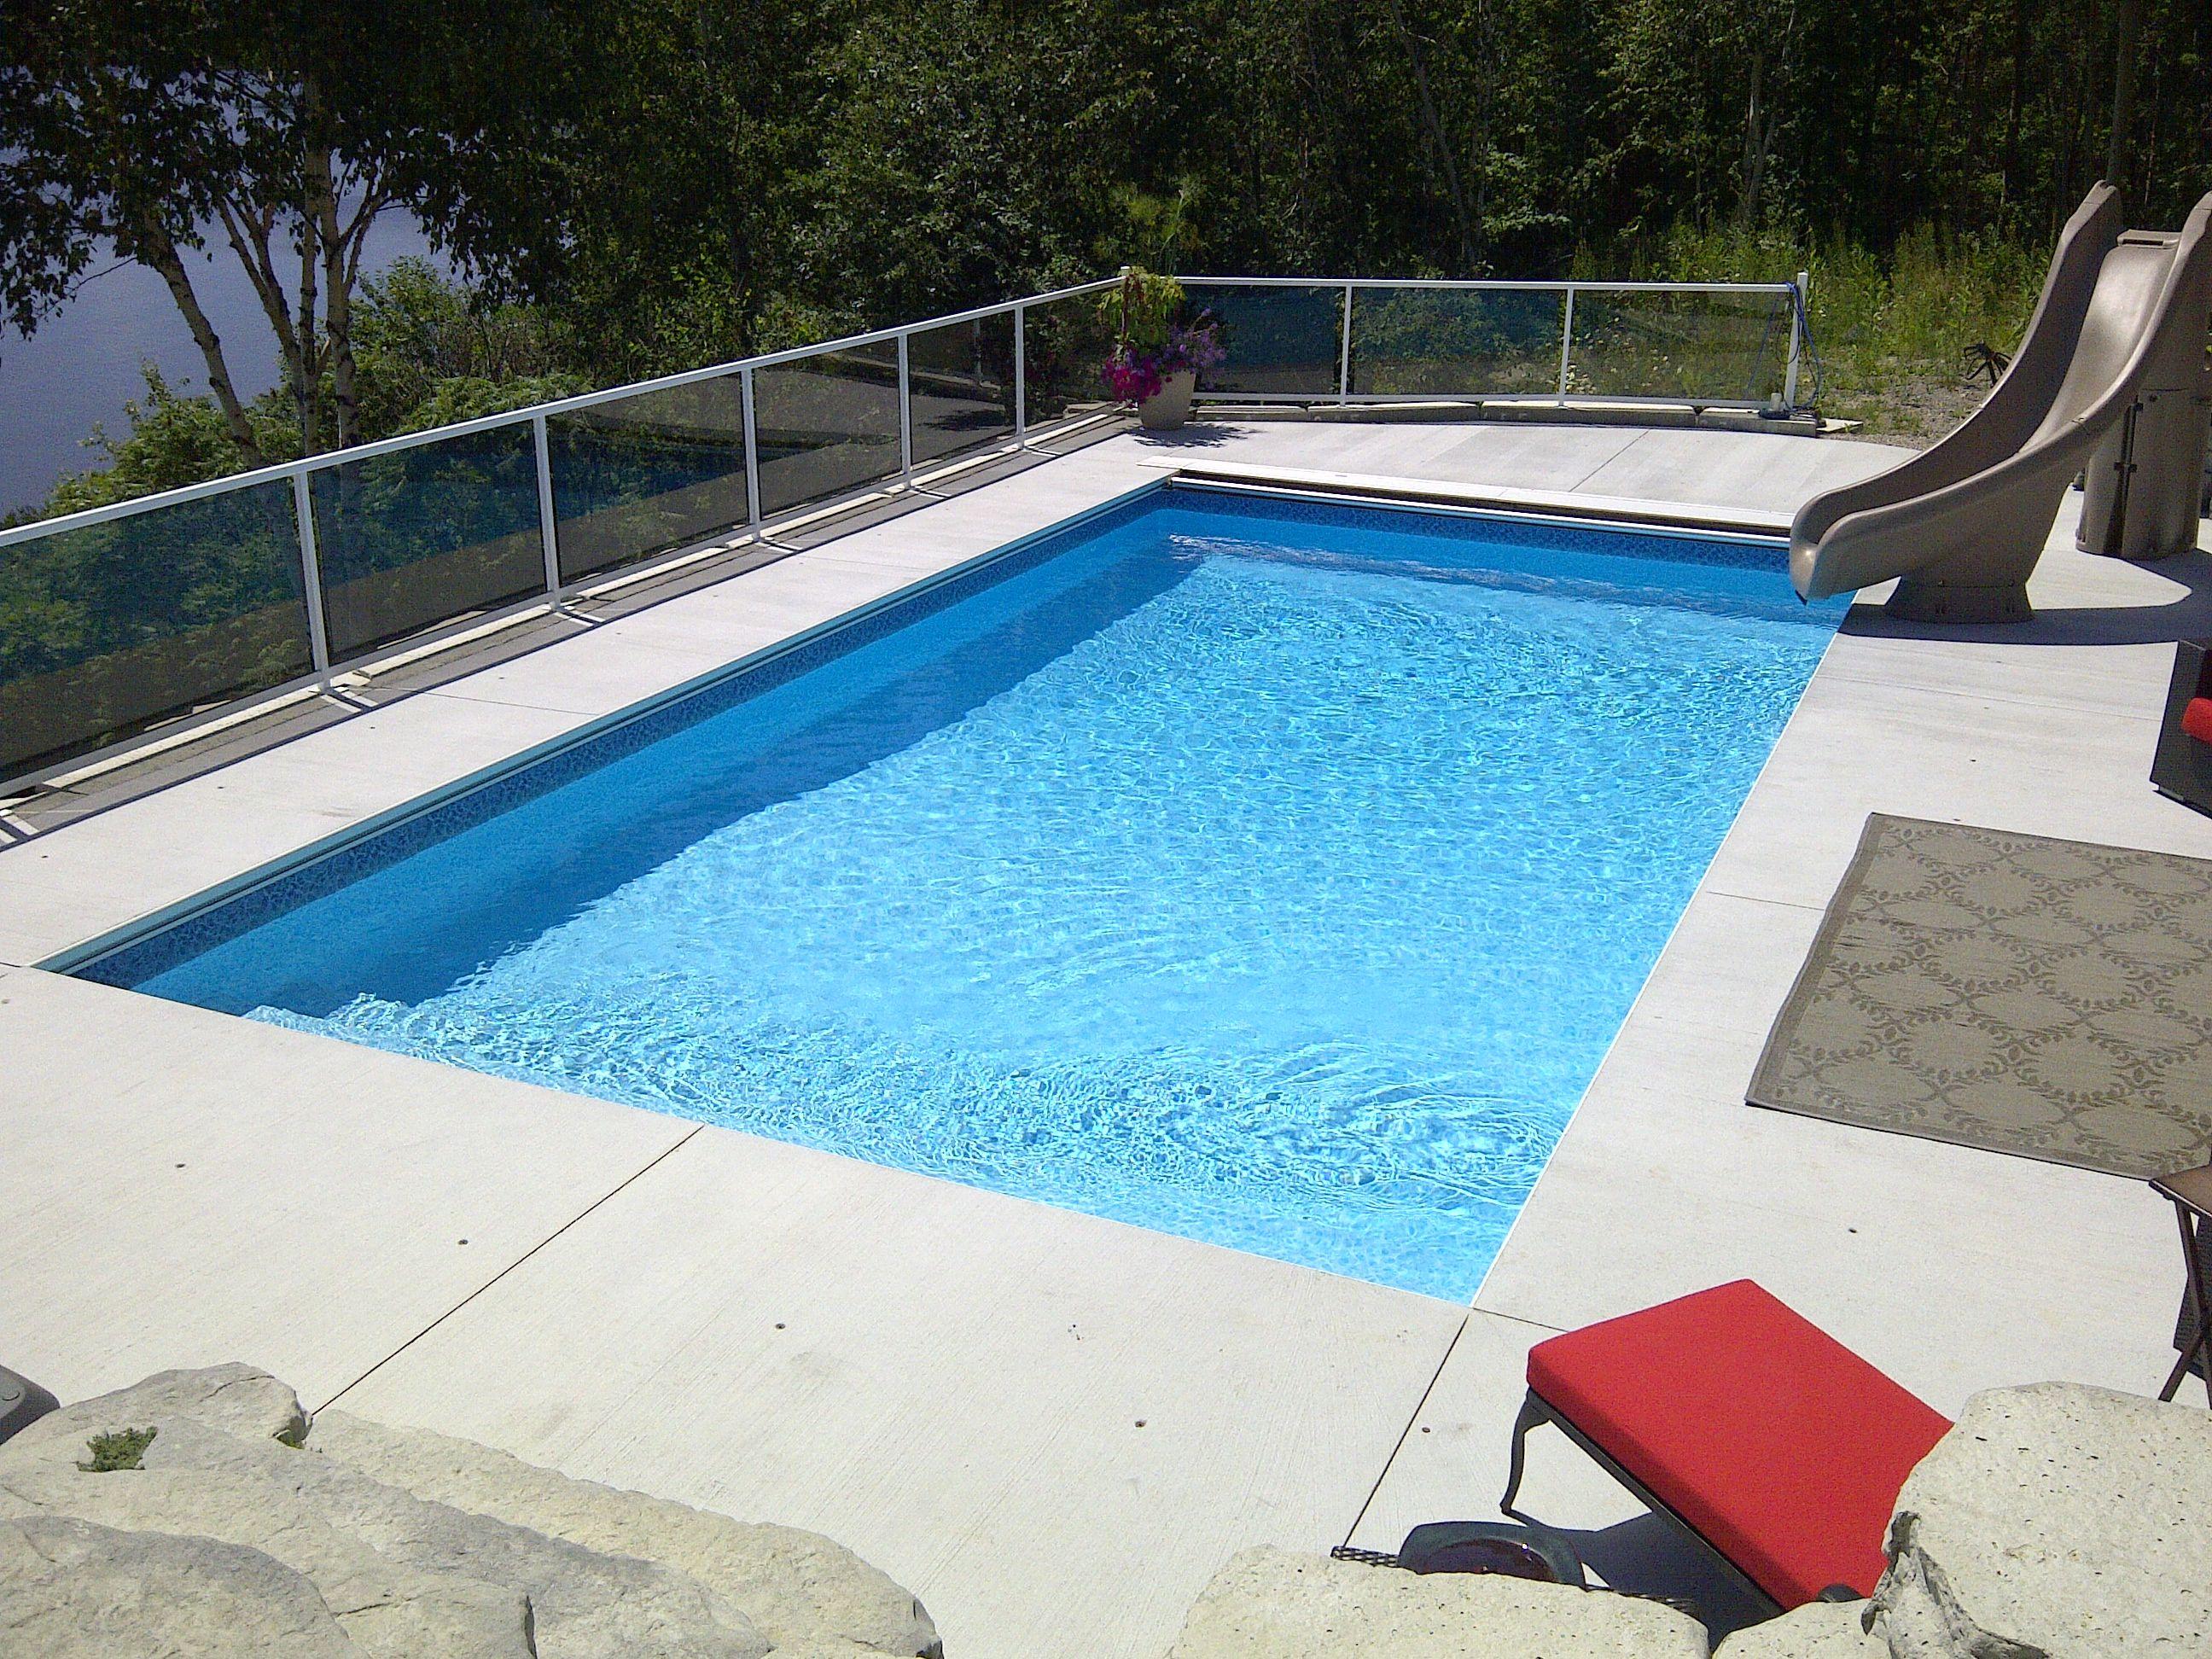 Rectangle Inground Pools 16x32 rectangle with 2 foot radius corners | inground swimming